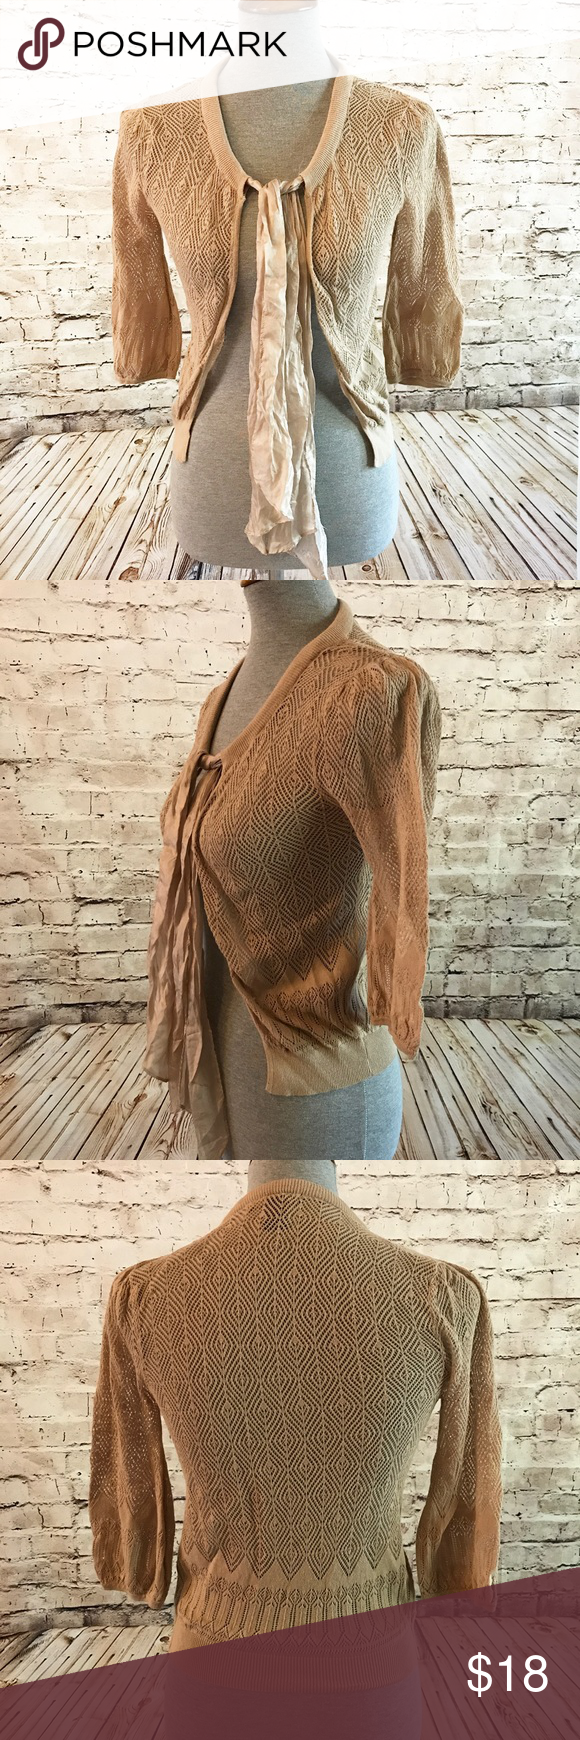 MNG Suit Crochet Lace Shrug Ribbon Tie Tan Sweater | Lace shrug ...